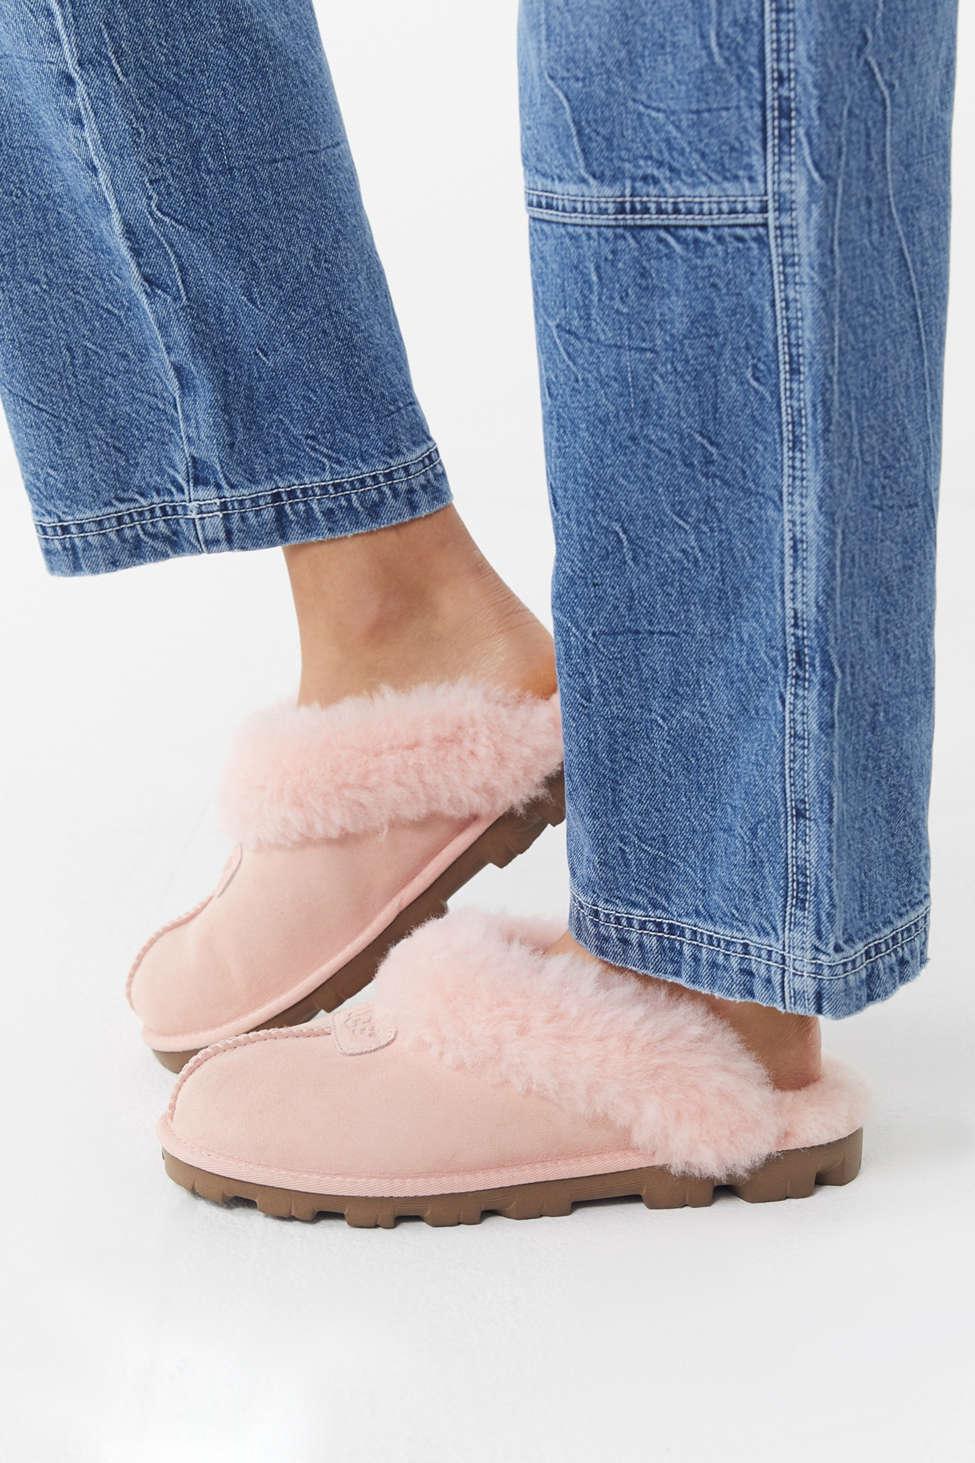 1d4b43ec09e Ugg Pink Coquette Clog Slipper